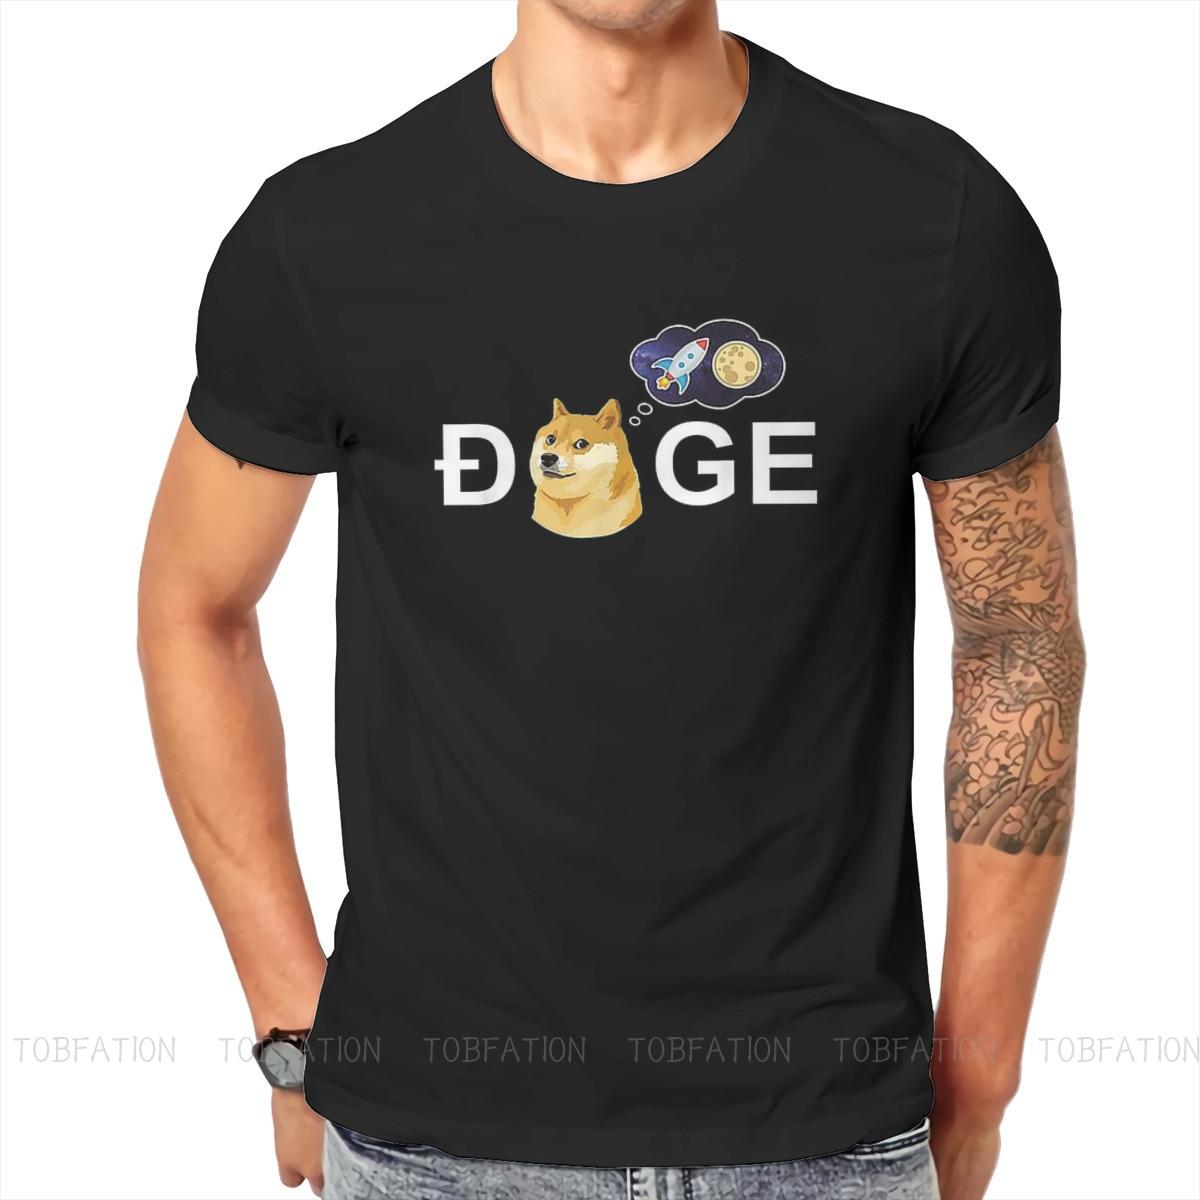 Bitcoin Cryptocurrency Art Dogecoin Doge HODL To the Moon Meme T Shirt Vintage Oversized Cotton Men Tees Harajuku O-Neck TShirt 1